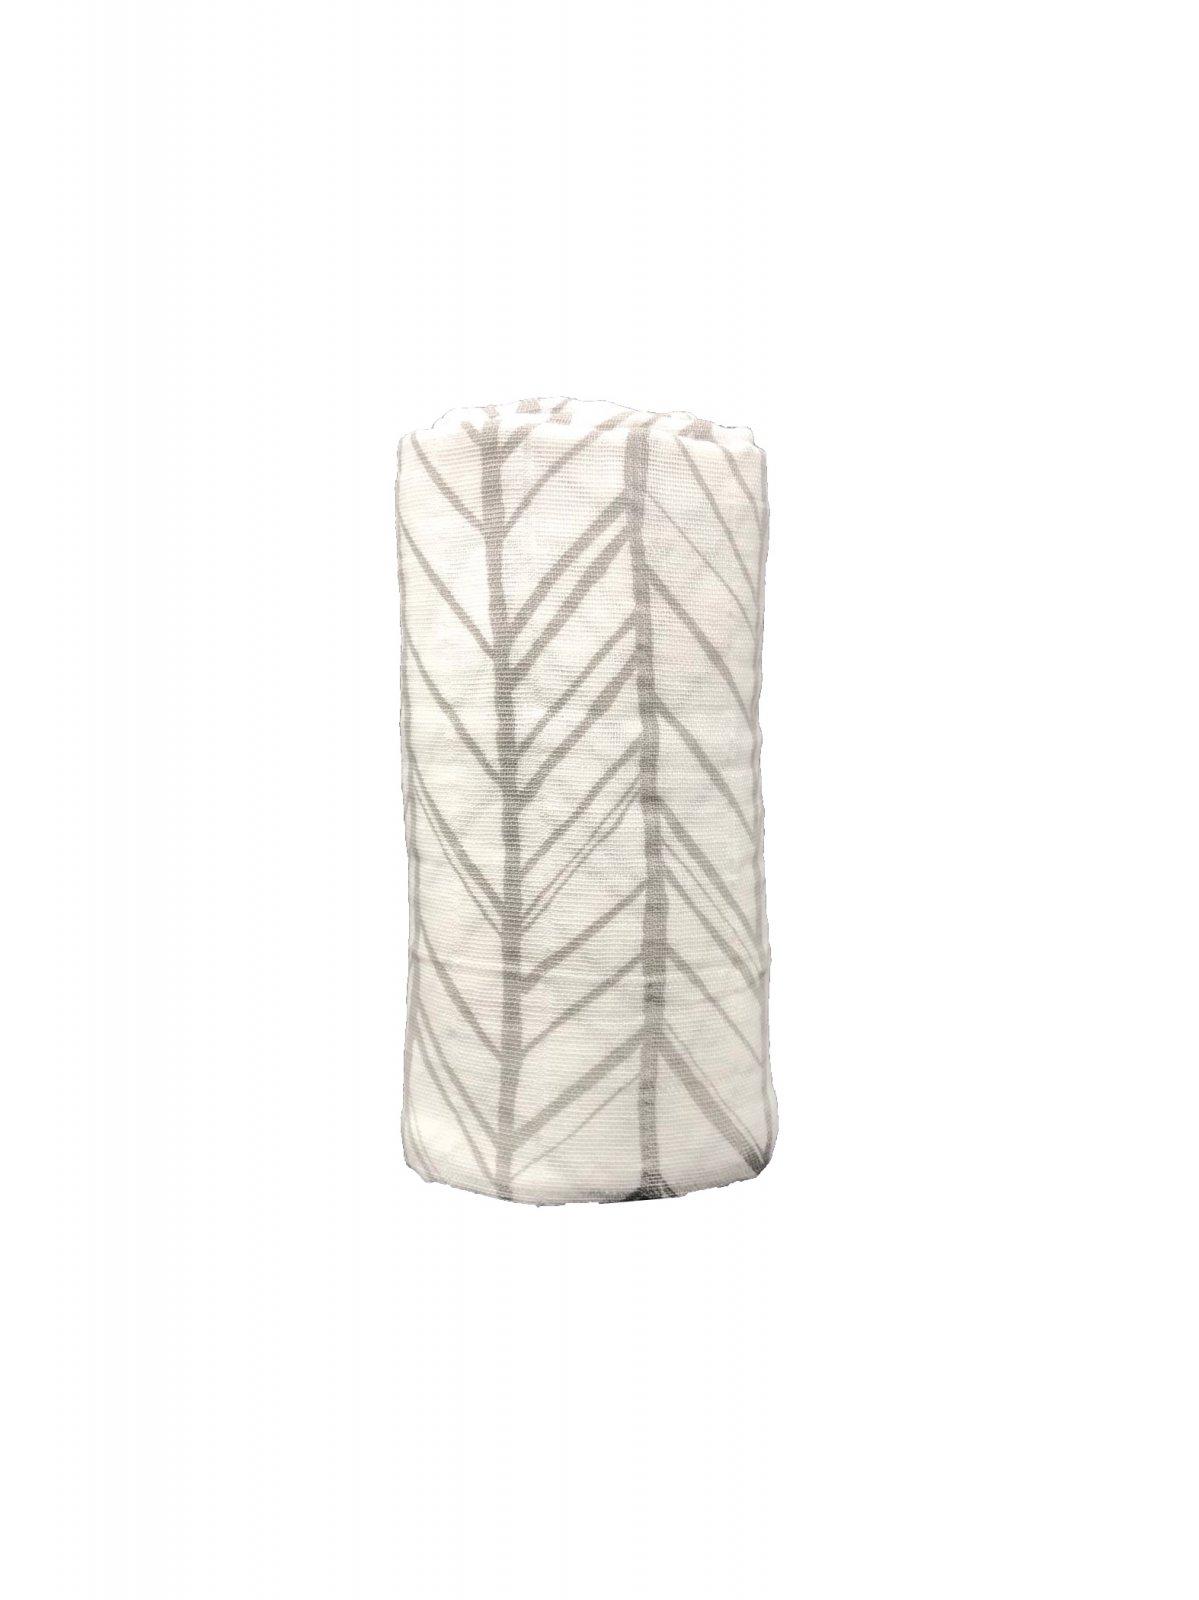 Herringbone Gray Swaddle